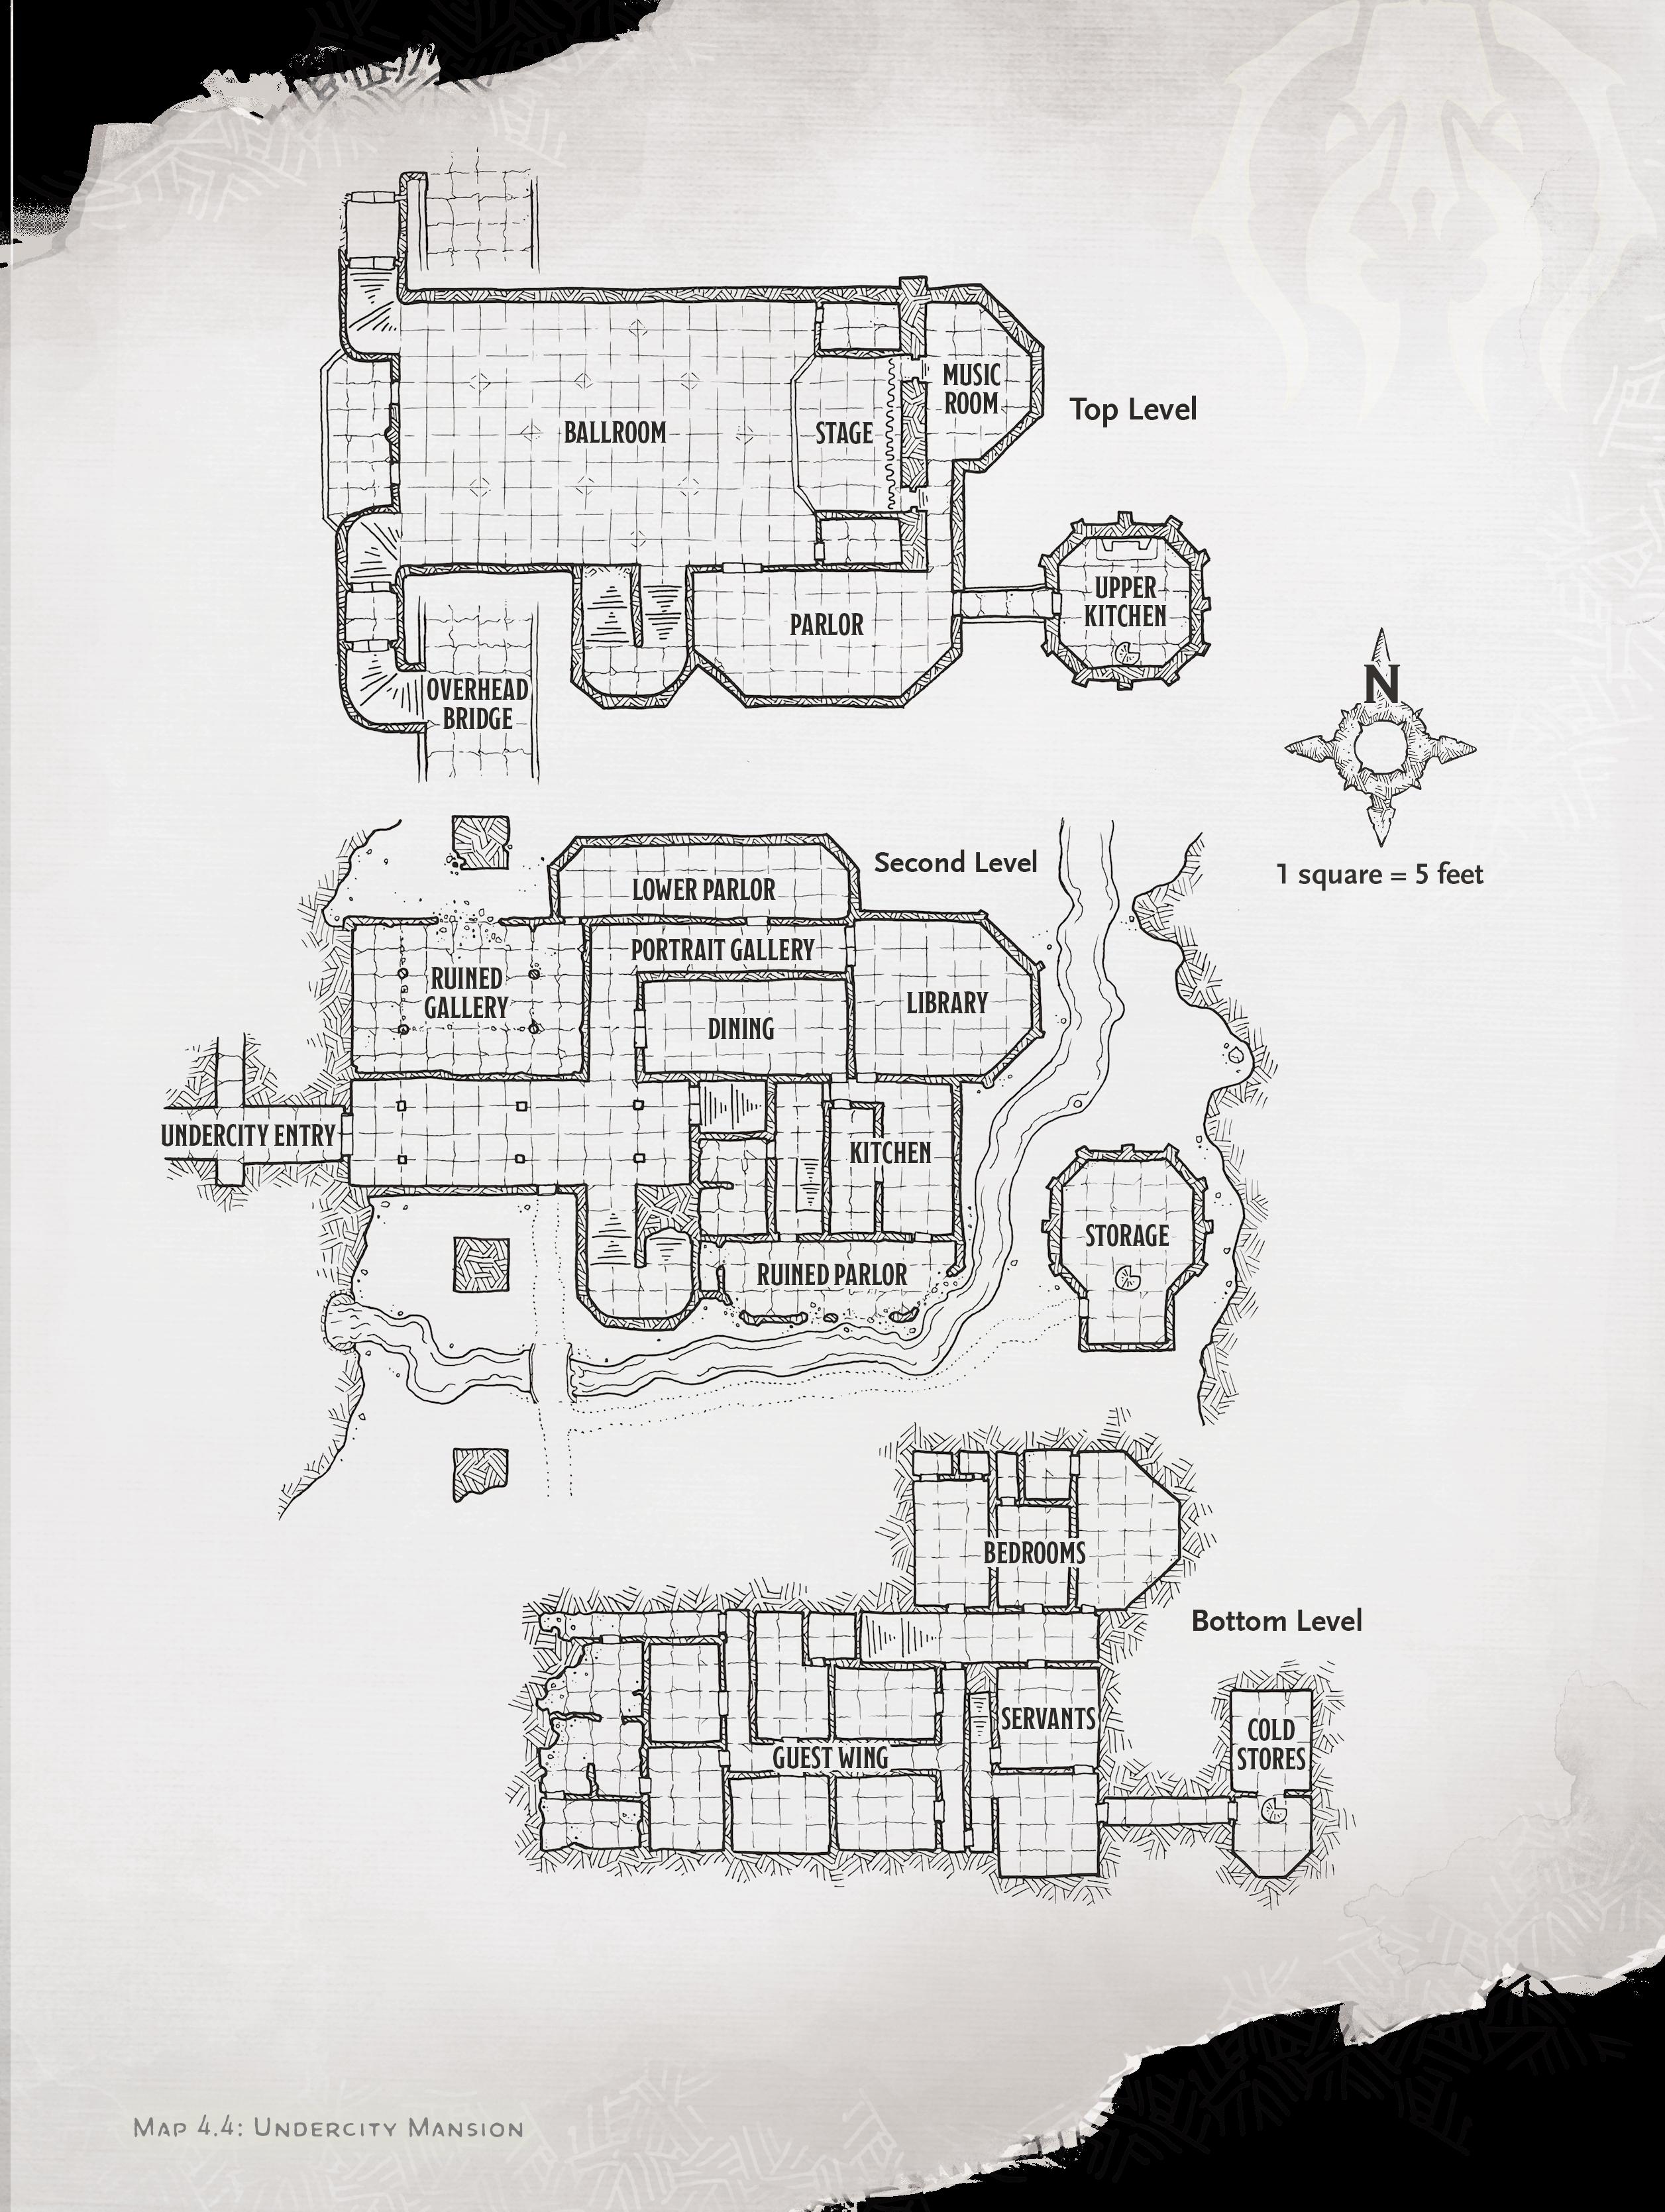 undercity mansion map